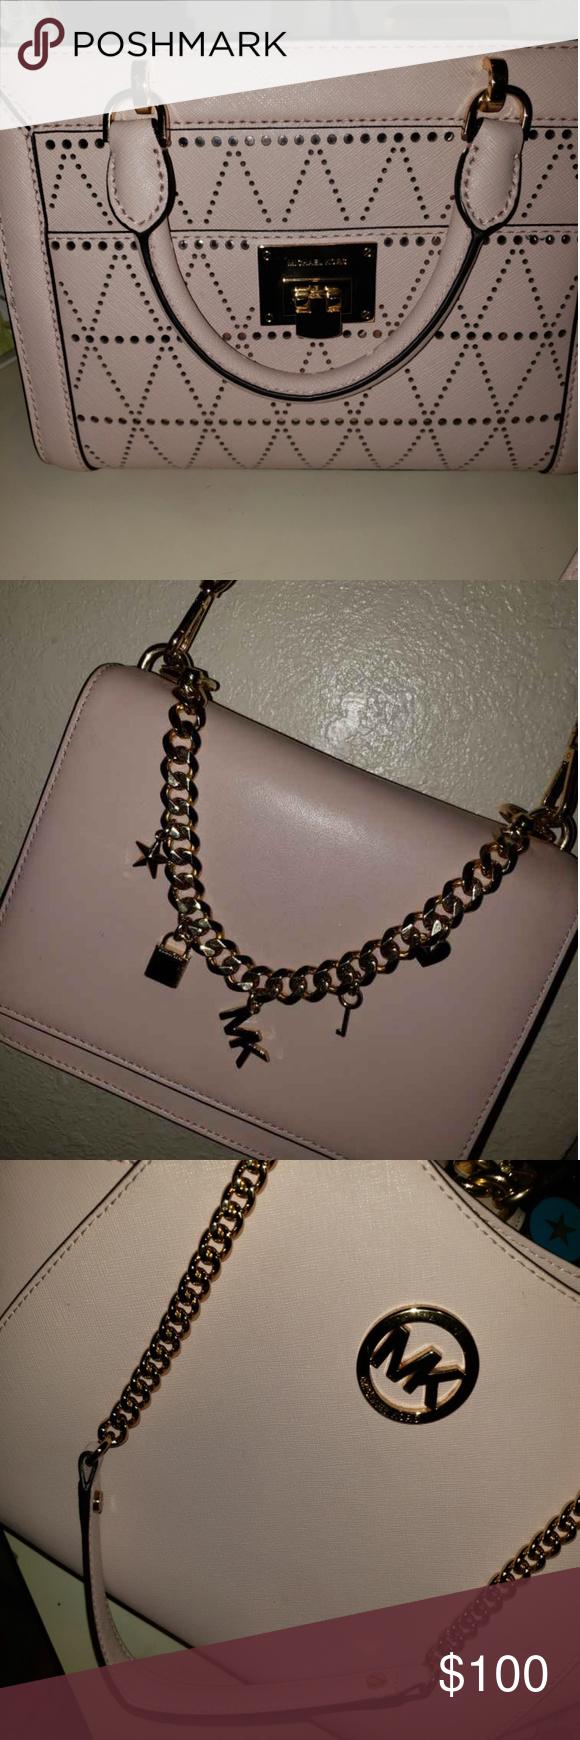 Blush MK purses 3 purses all like new Michael Kors Bags Shoulder Bags 8e0f735246